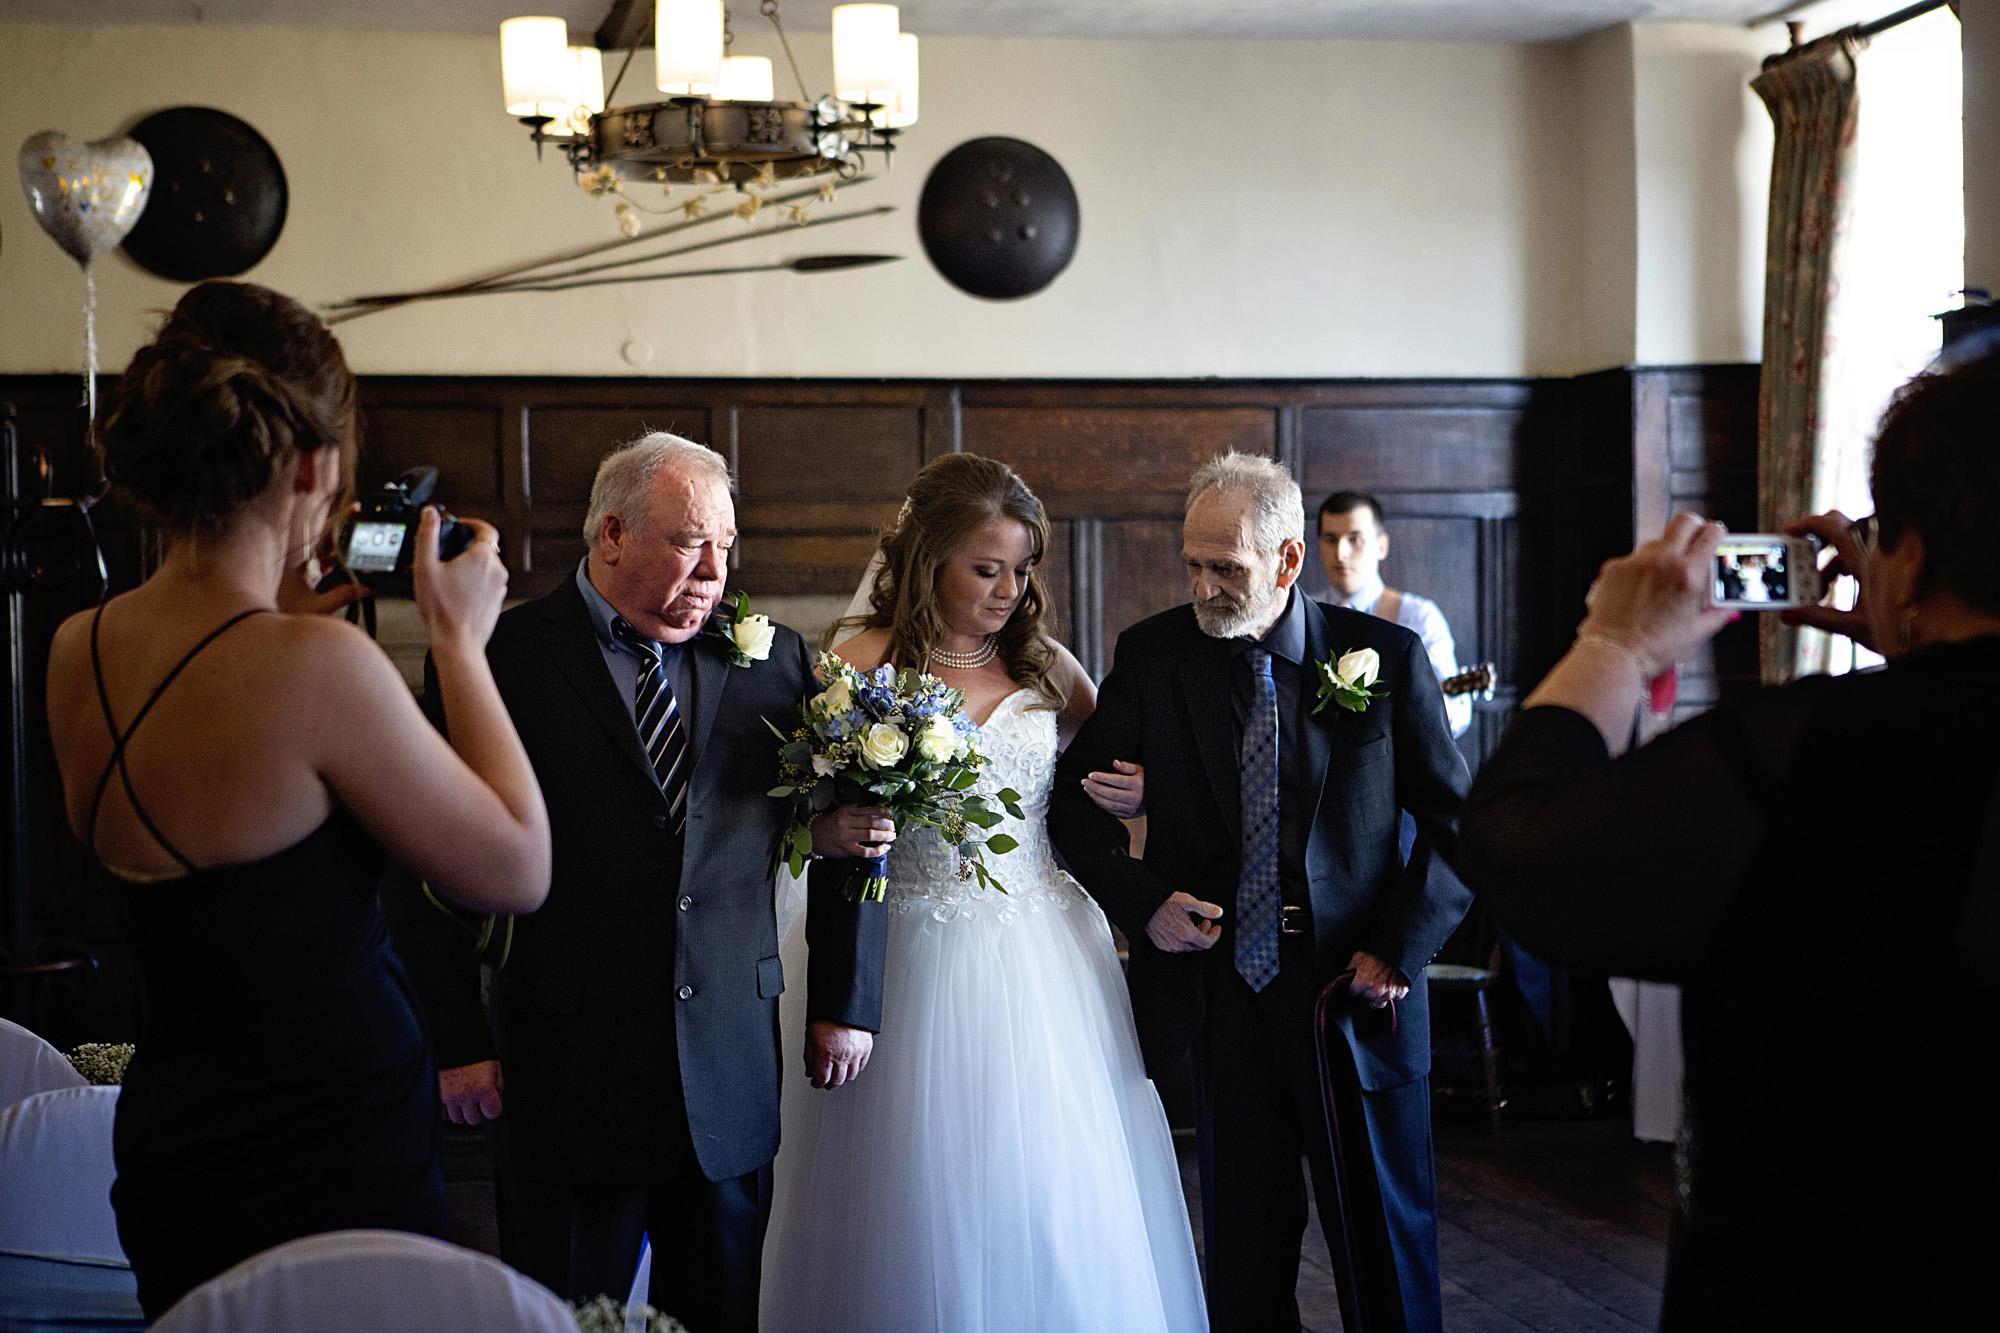 wedding-photos-talbot-hotel-oundle (10).jpg